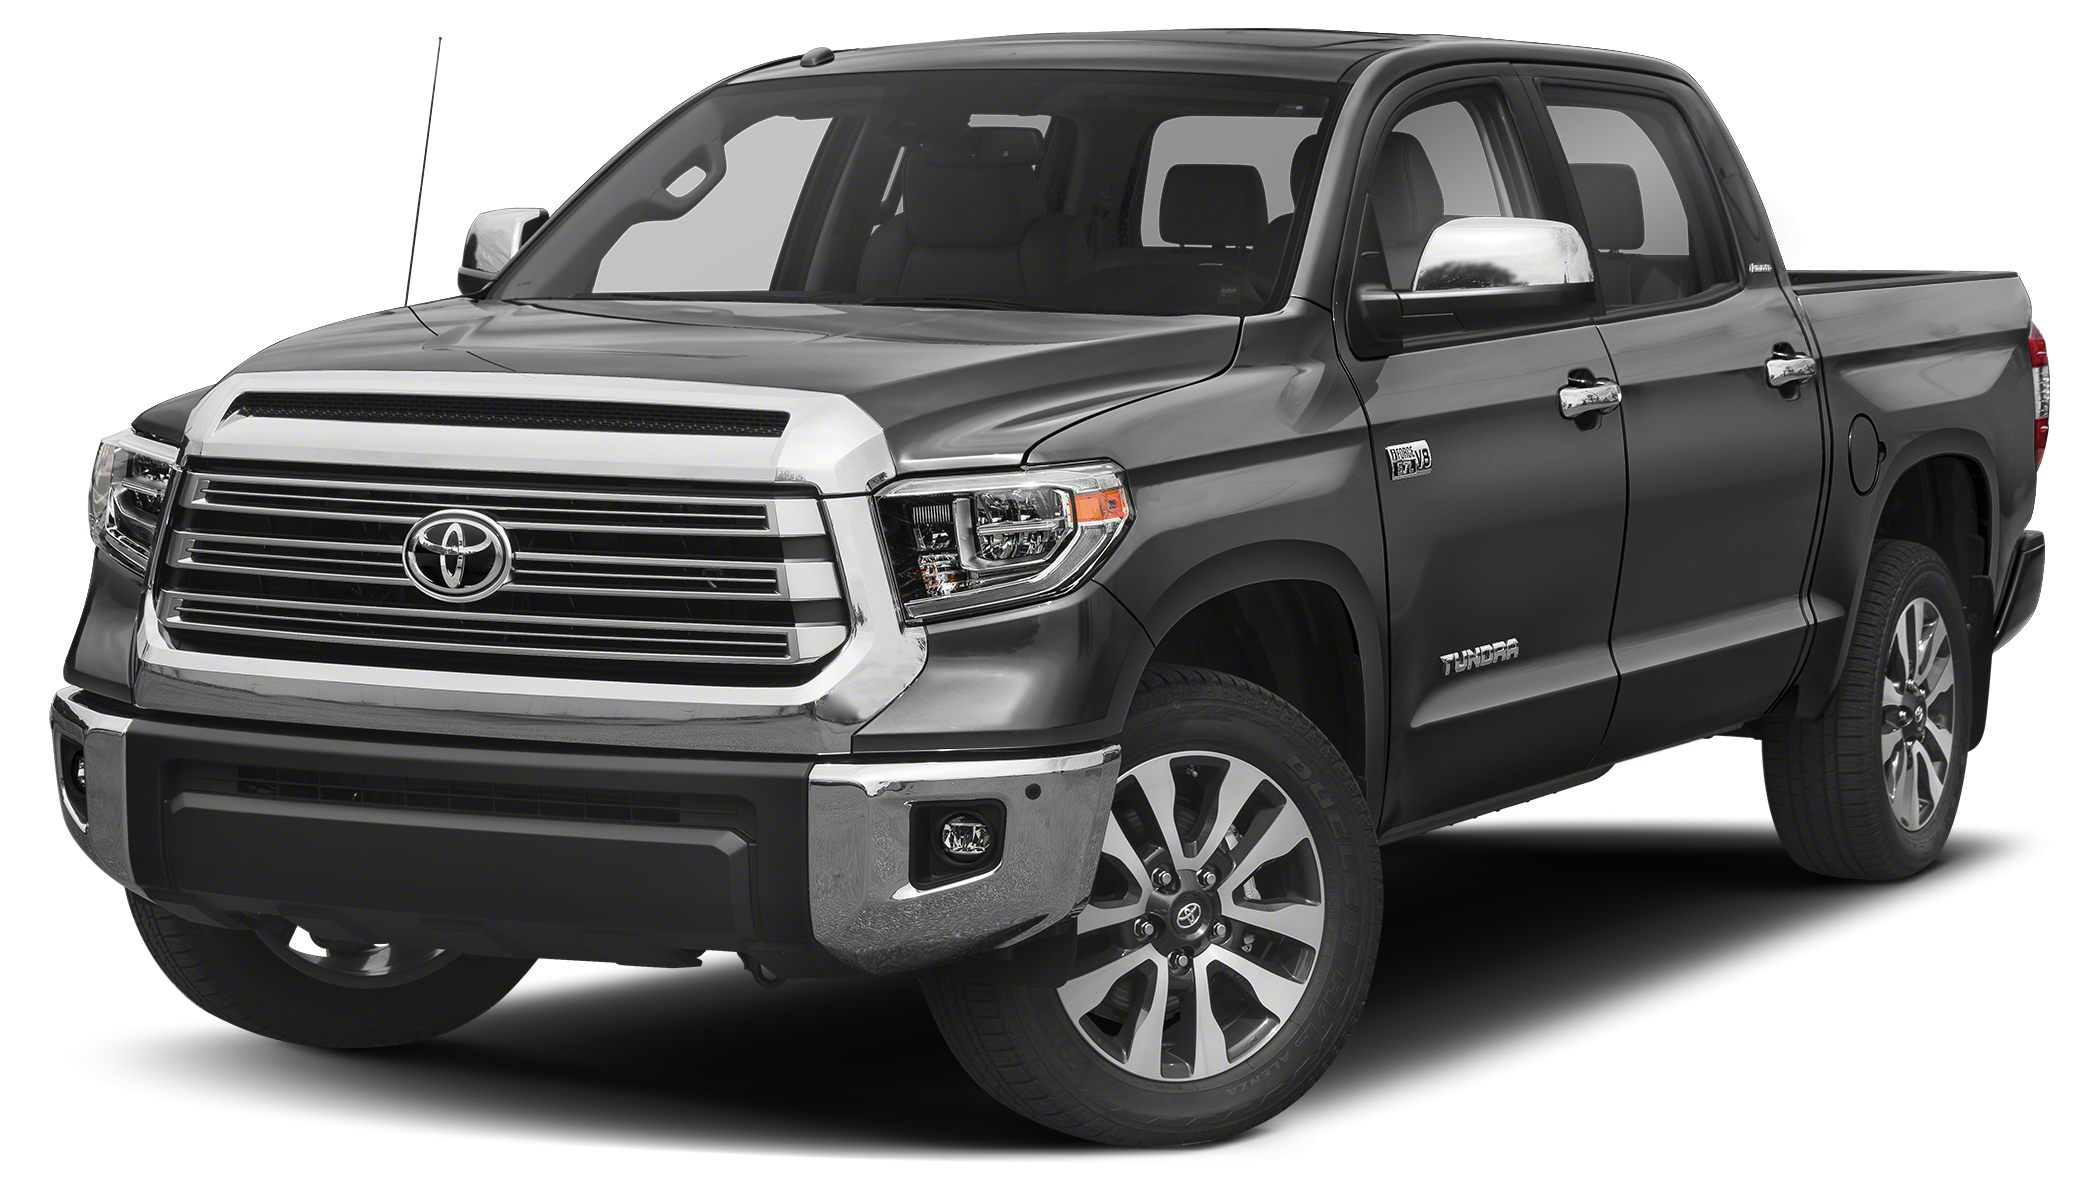 2018 Toyota Tundra SR5 SR5 trim MAGNETIC GRAY METALLIC exterior and GRAPHITE interior iPodMP3 I